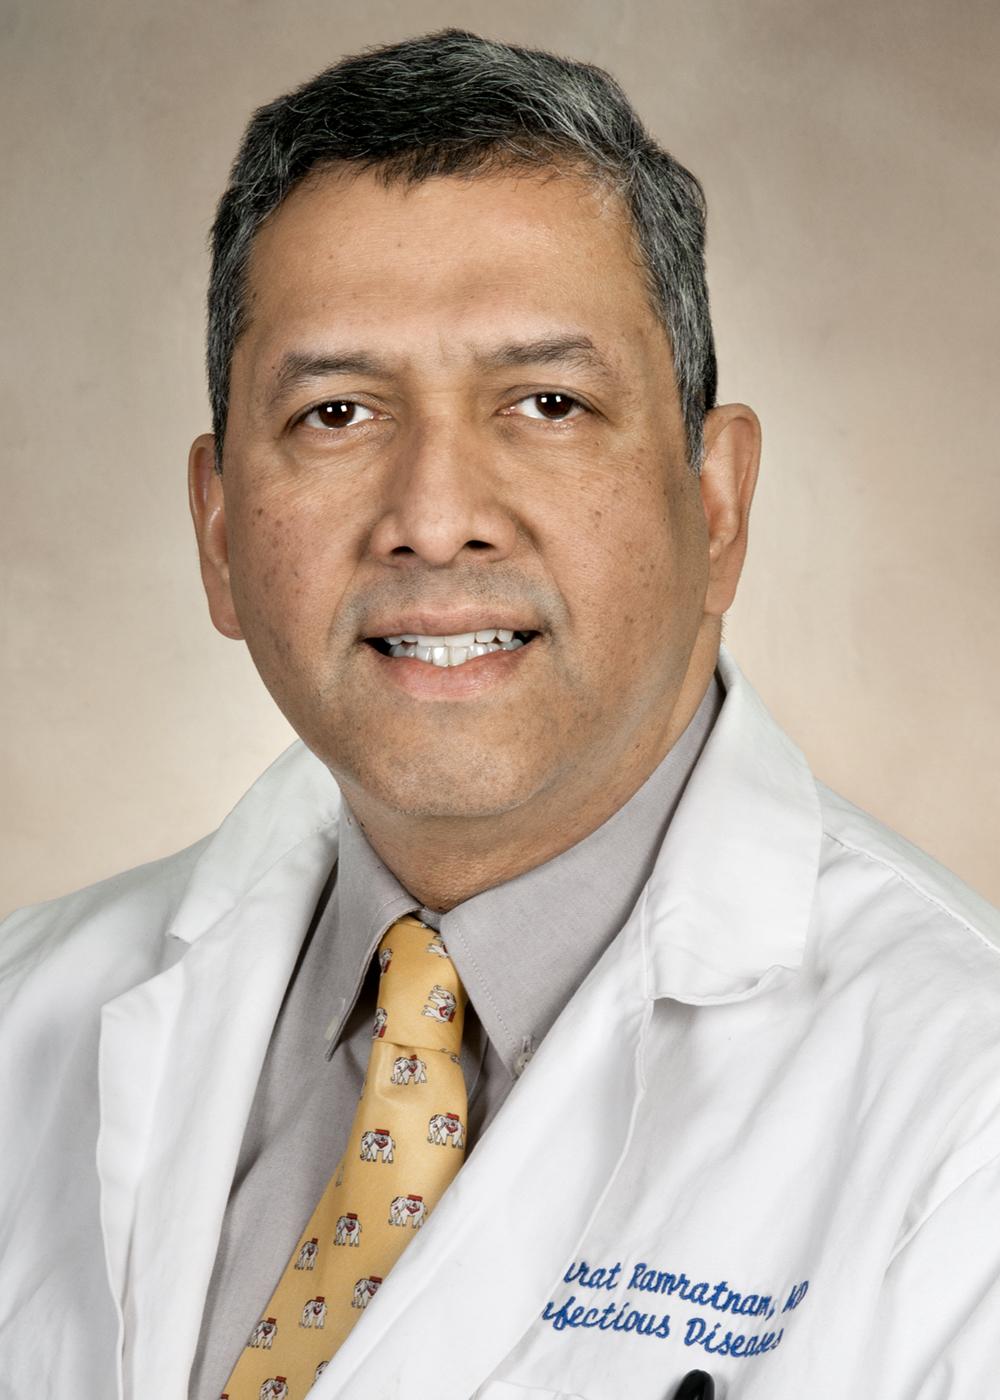 Dr. Bharat Ramratnam